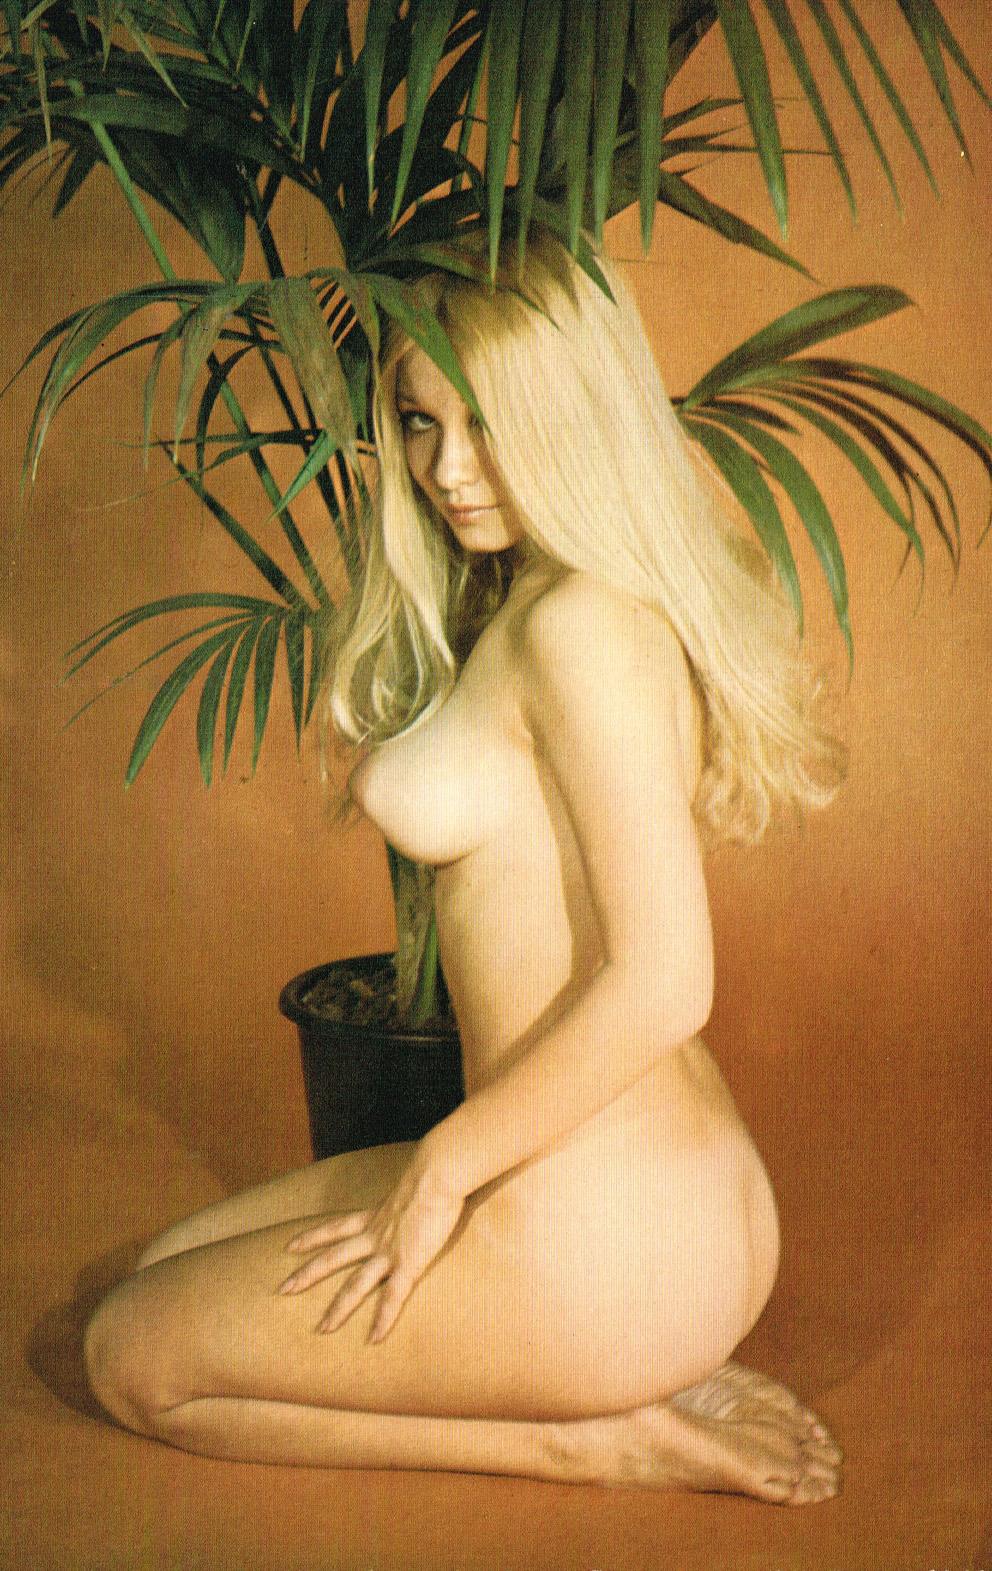 Dorit-Henk-Daily-Girl-magazine-1972